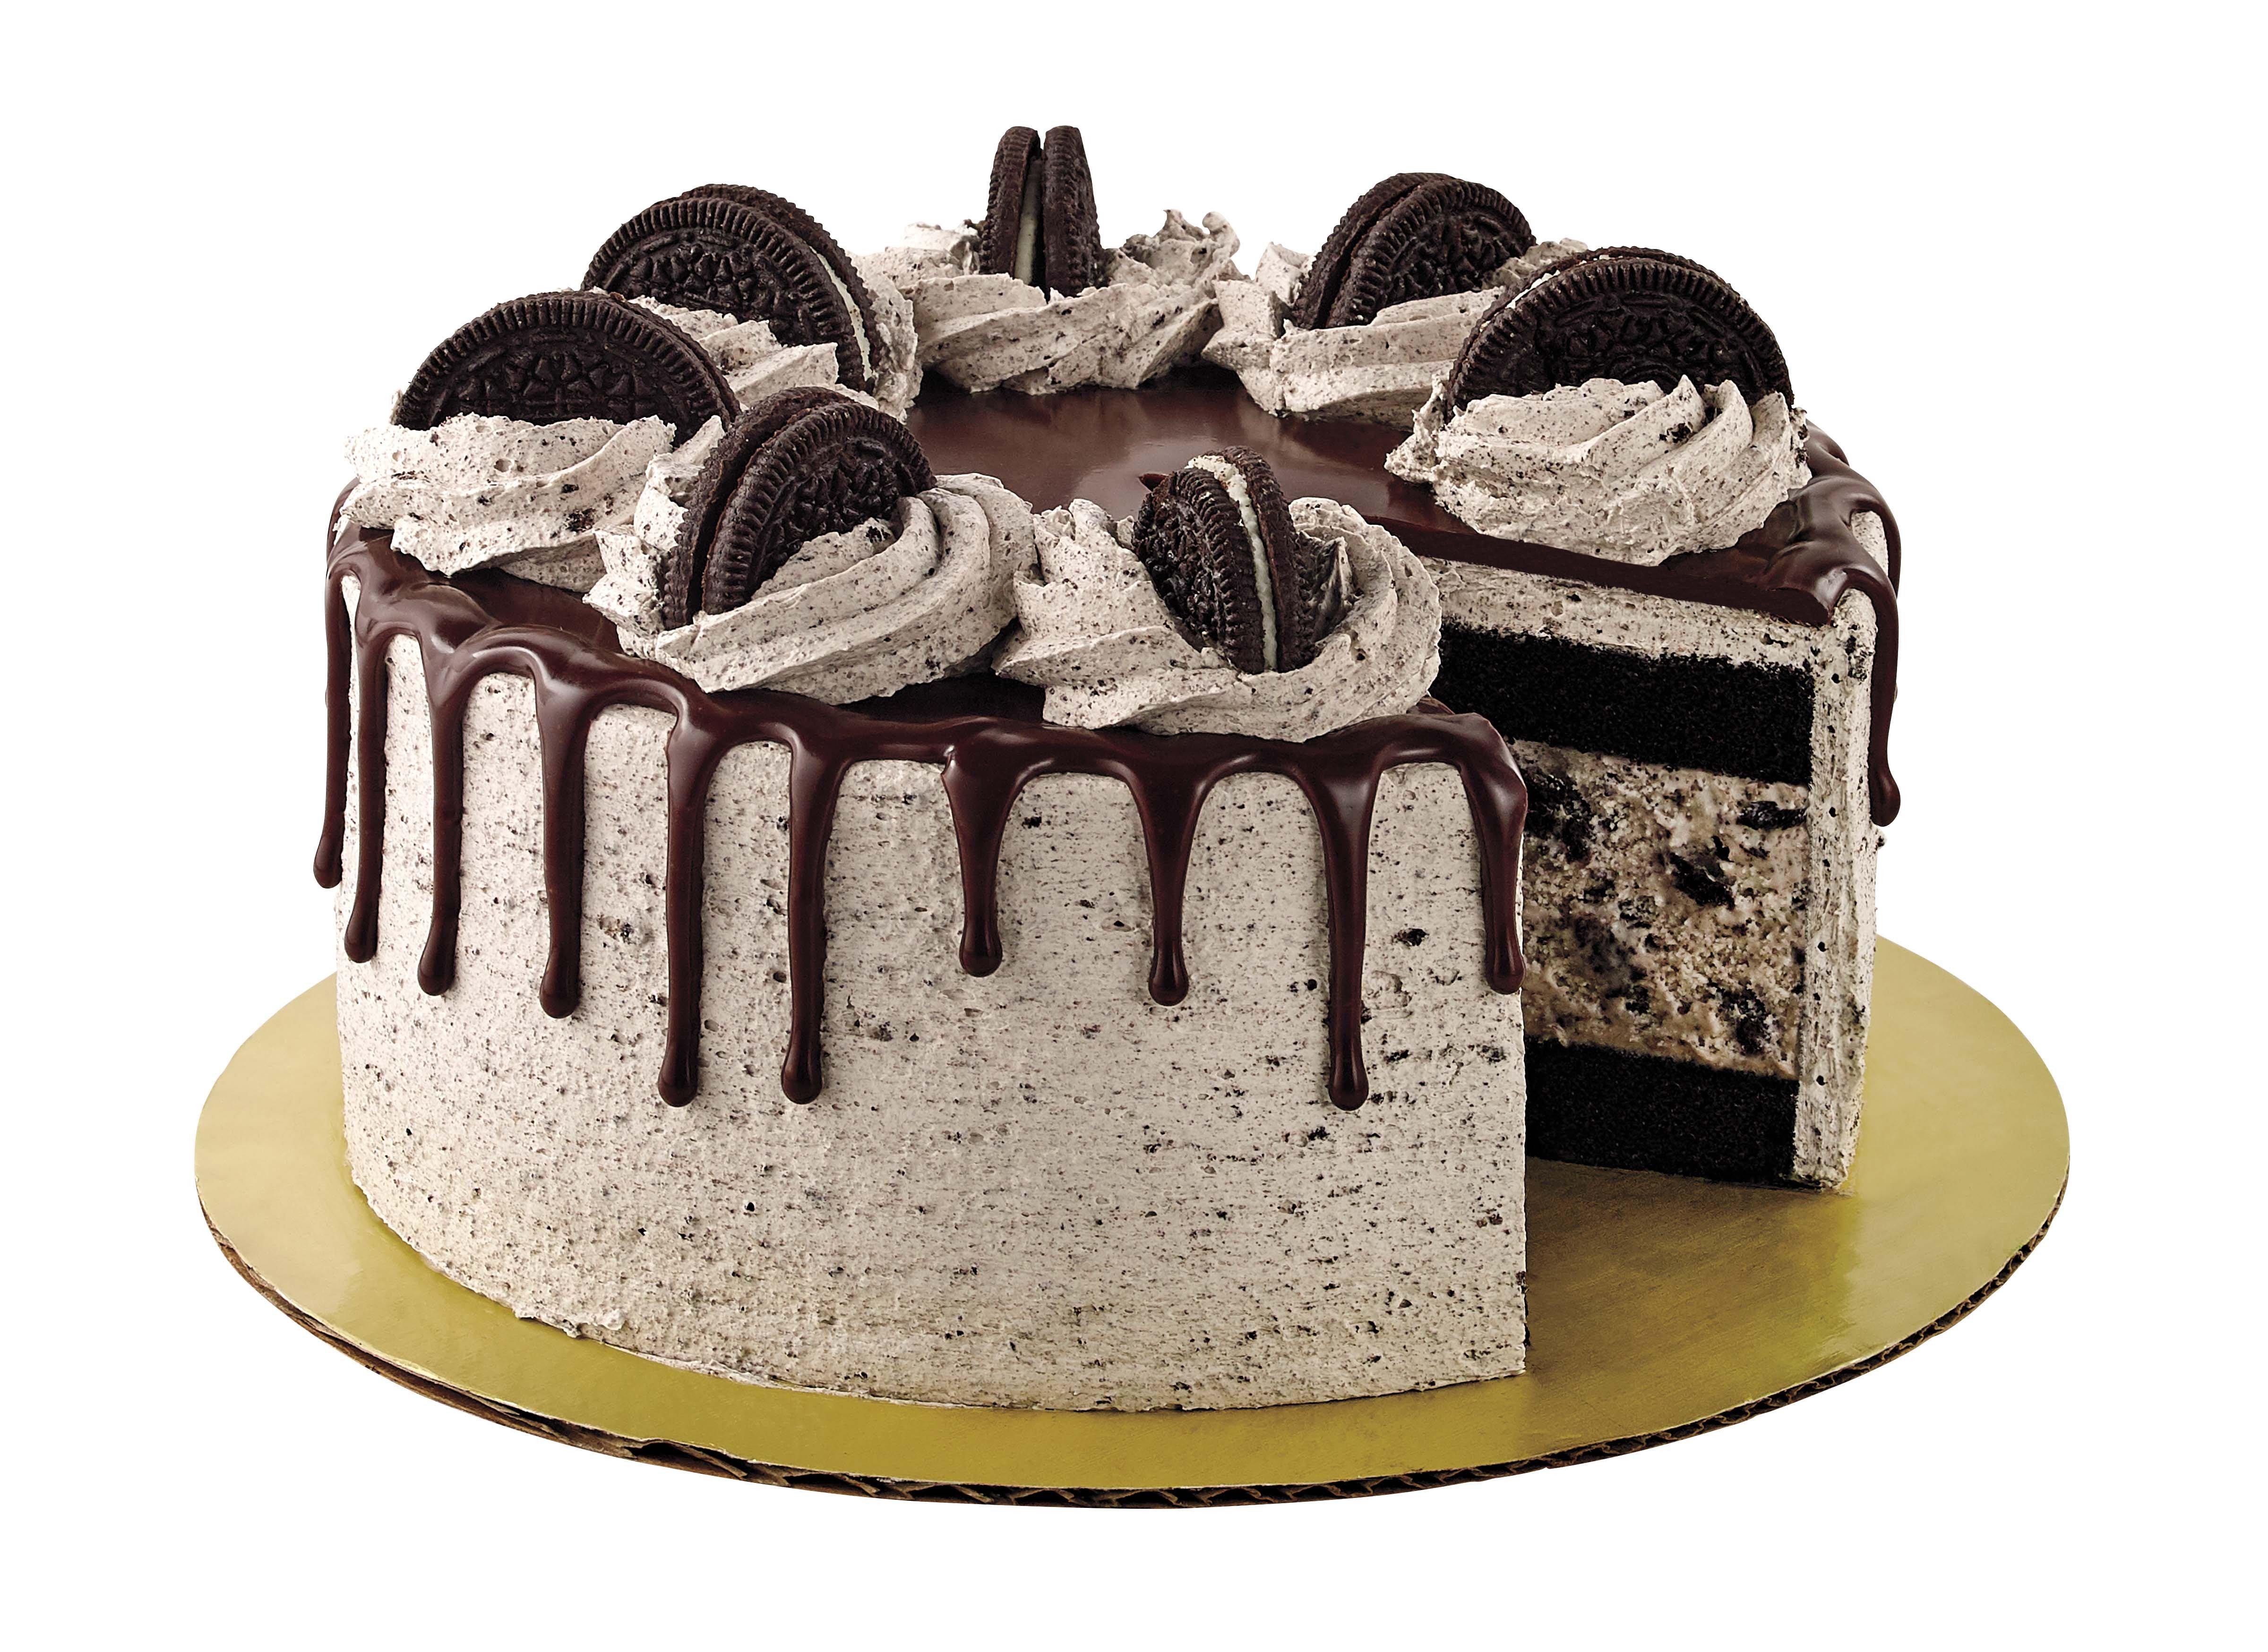 Groovy Heb Select Ingredients Cookies Cream Ice Cream Cake With Funny Birthday Cards Online Hendilapandamsfinfo